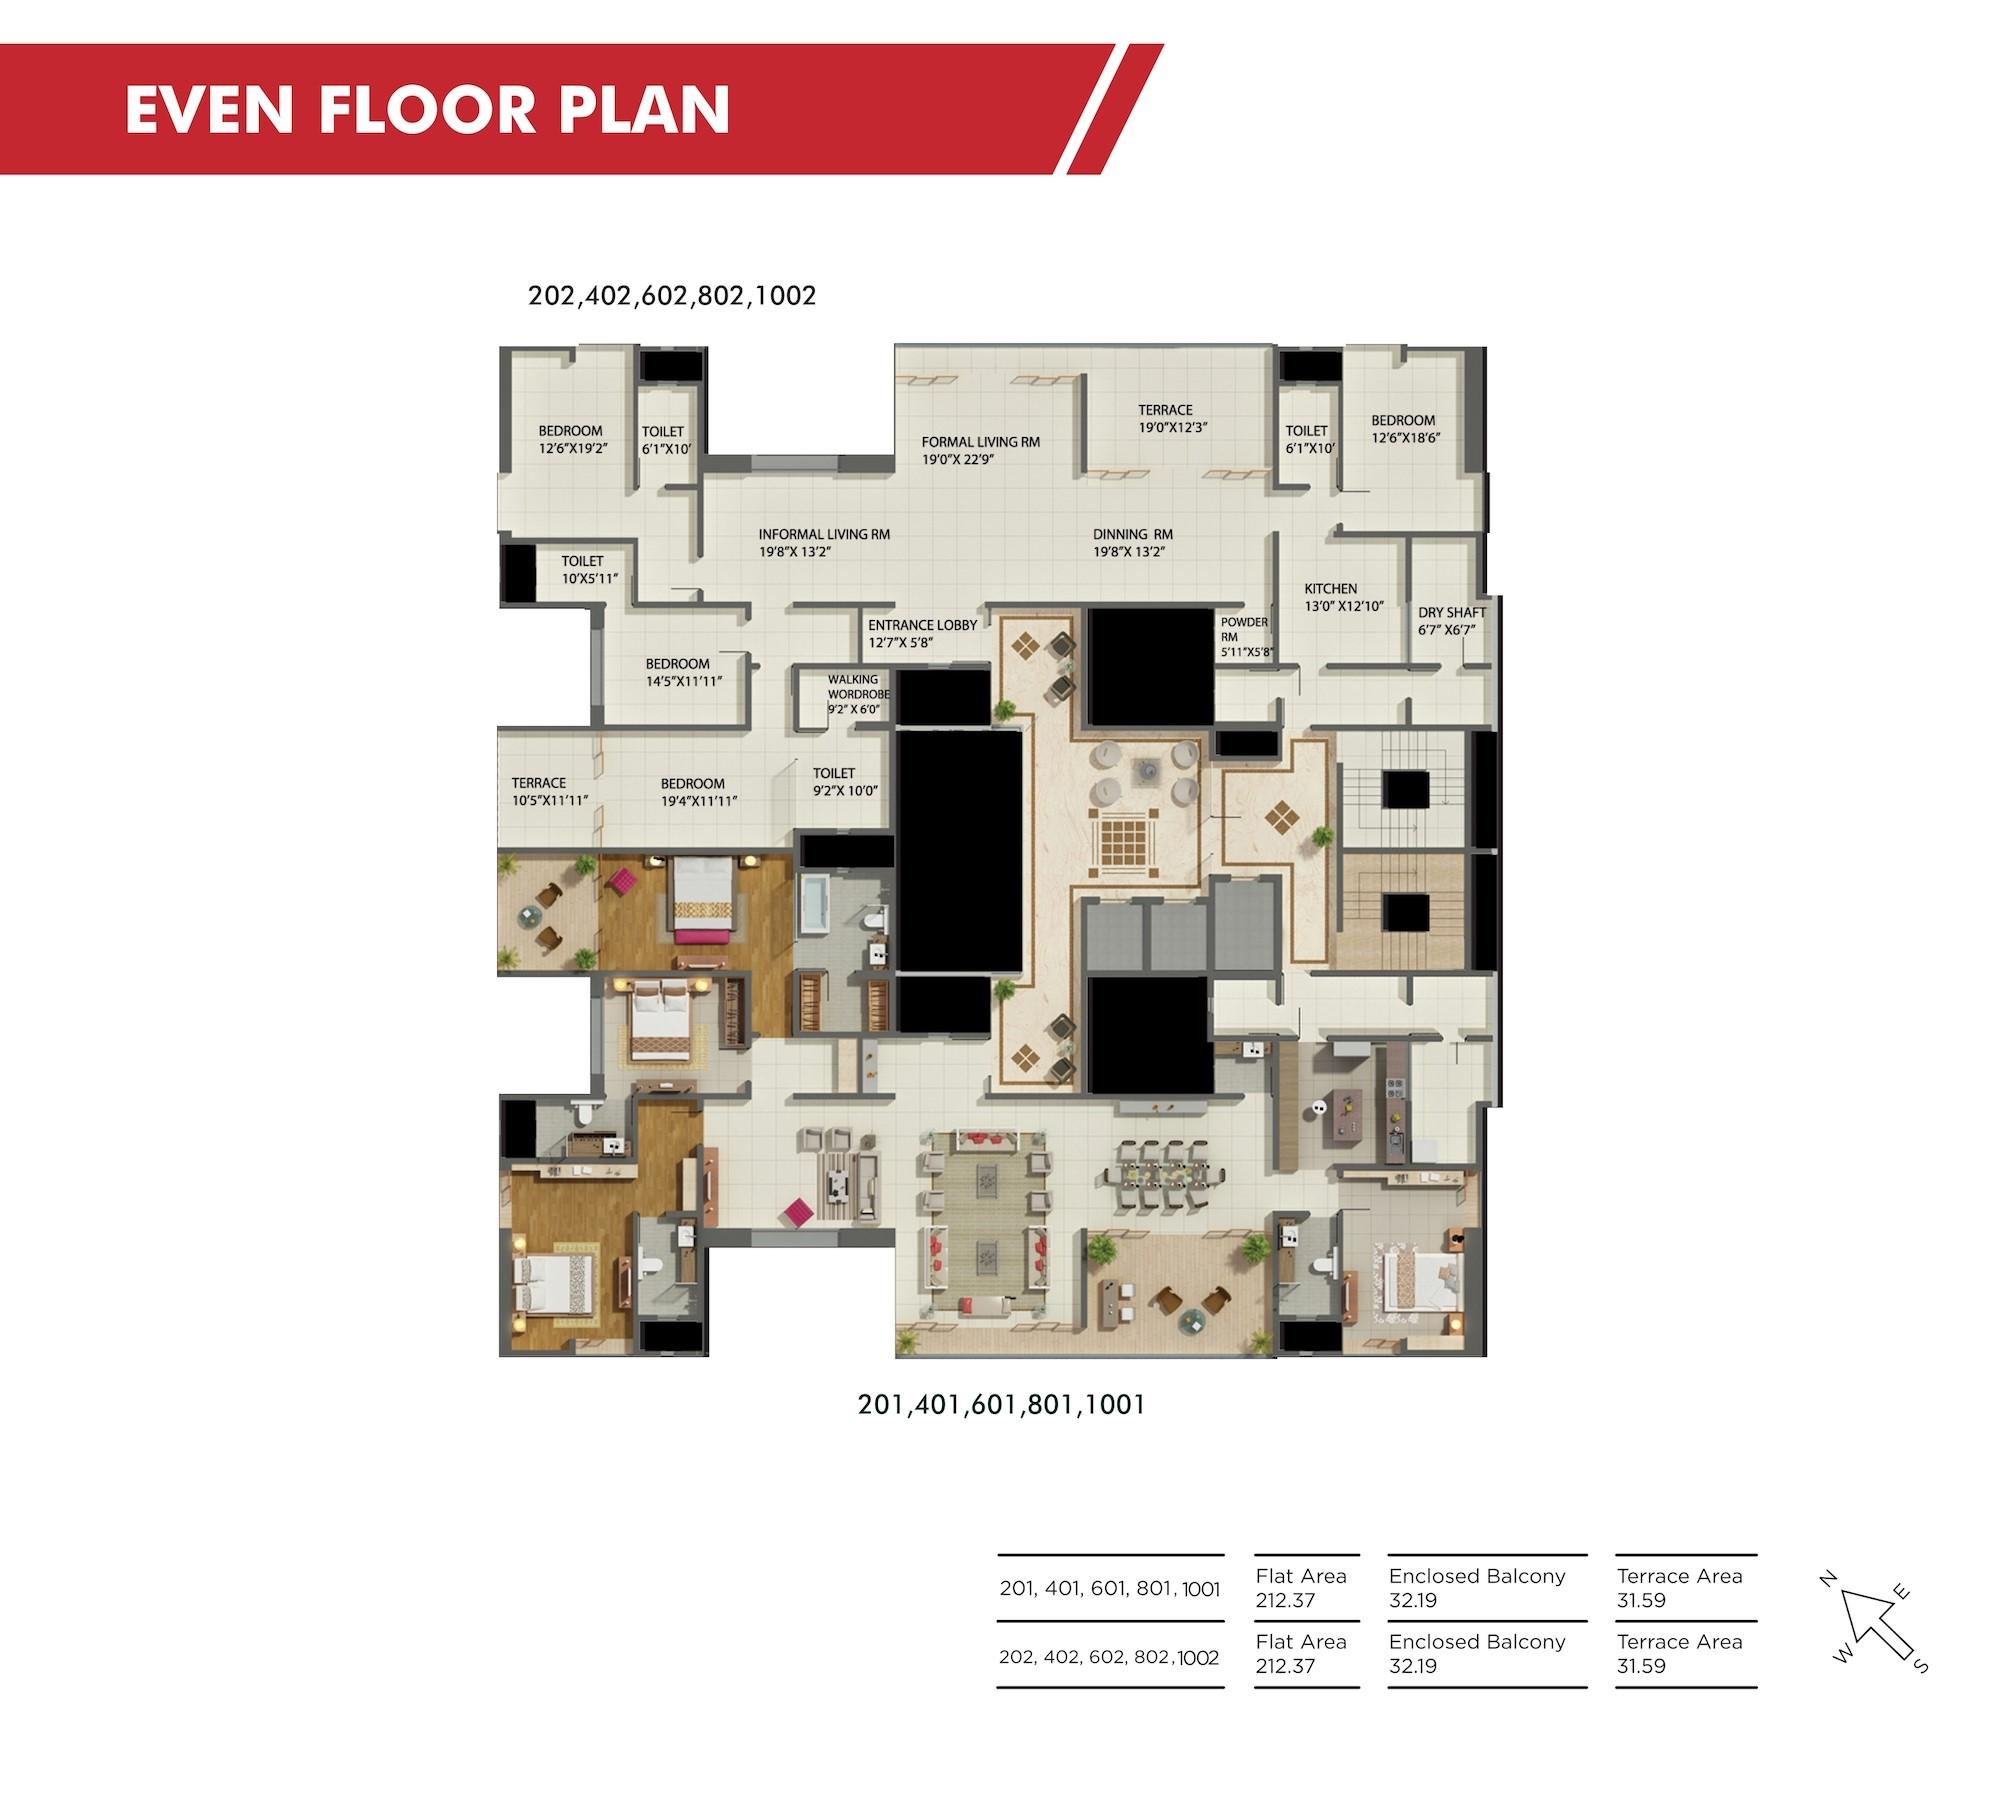 Shiloh Even Floor Plan